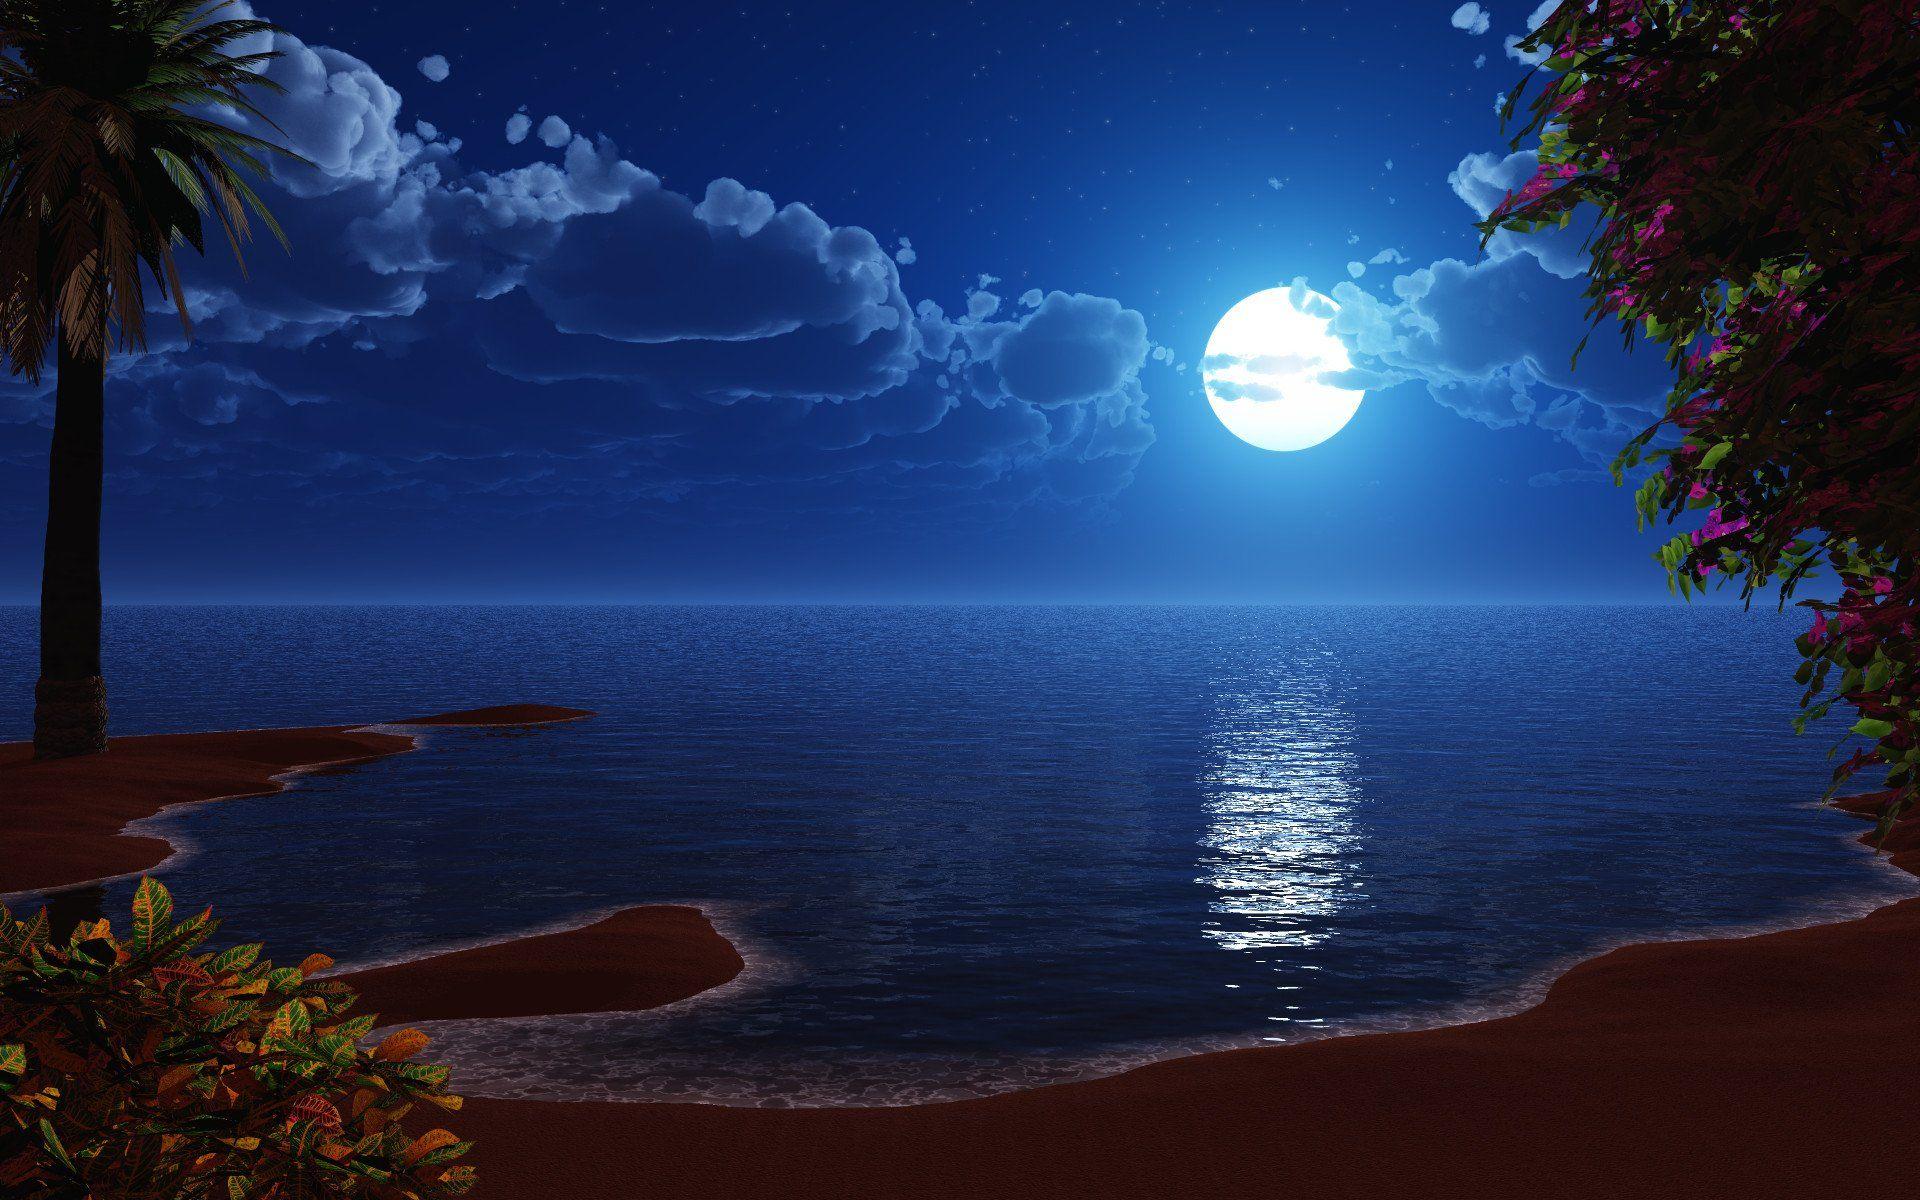 Beauty Of Moon High Definition Wallpaper Ocean At Night Beach At Night Beach Night